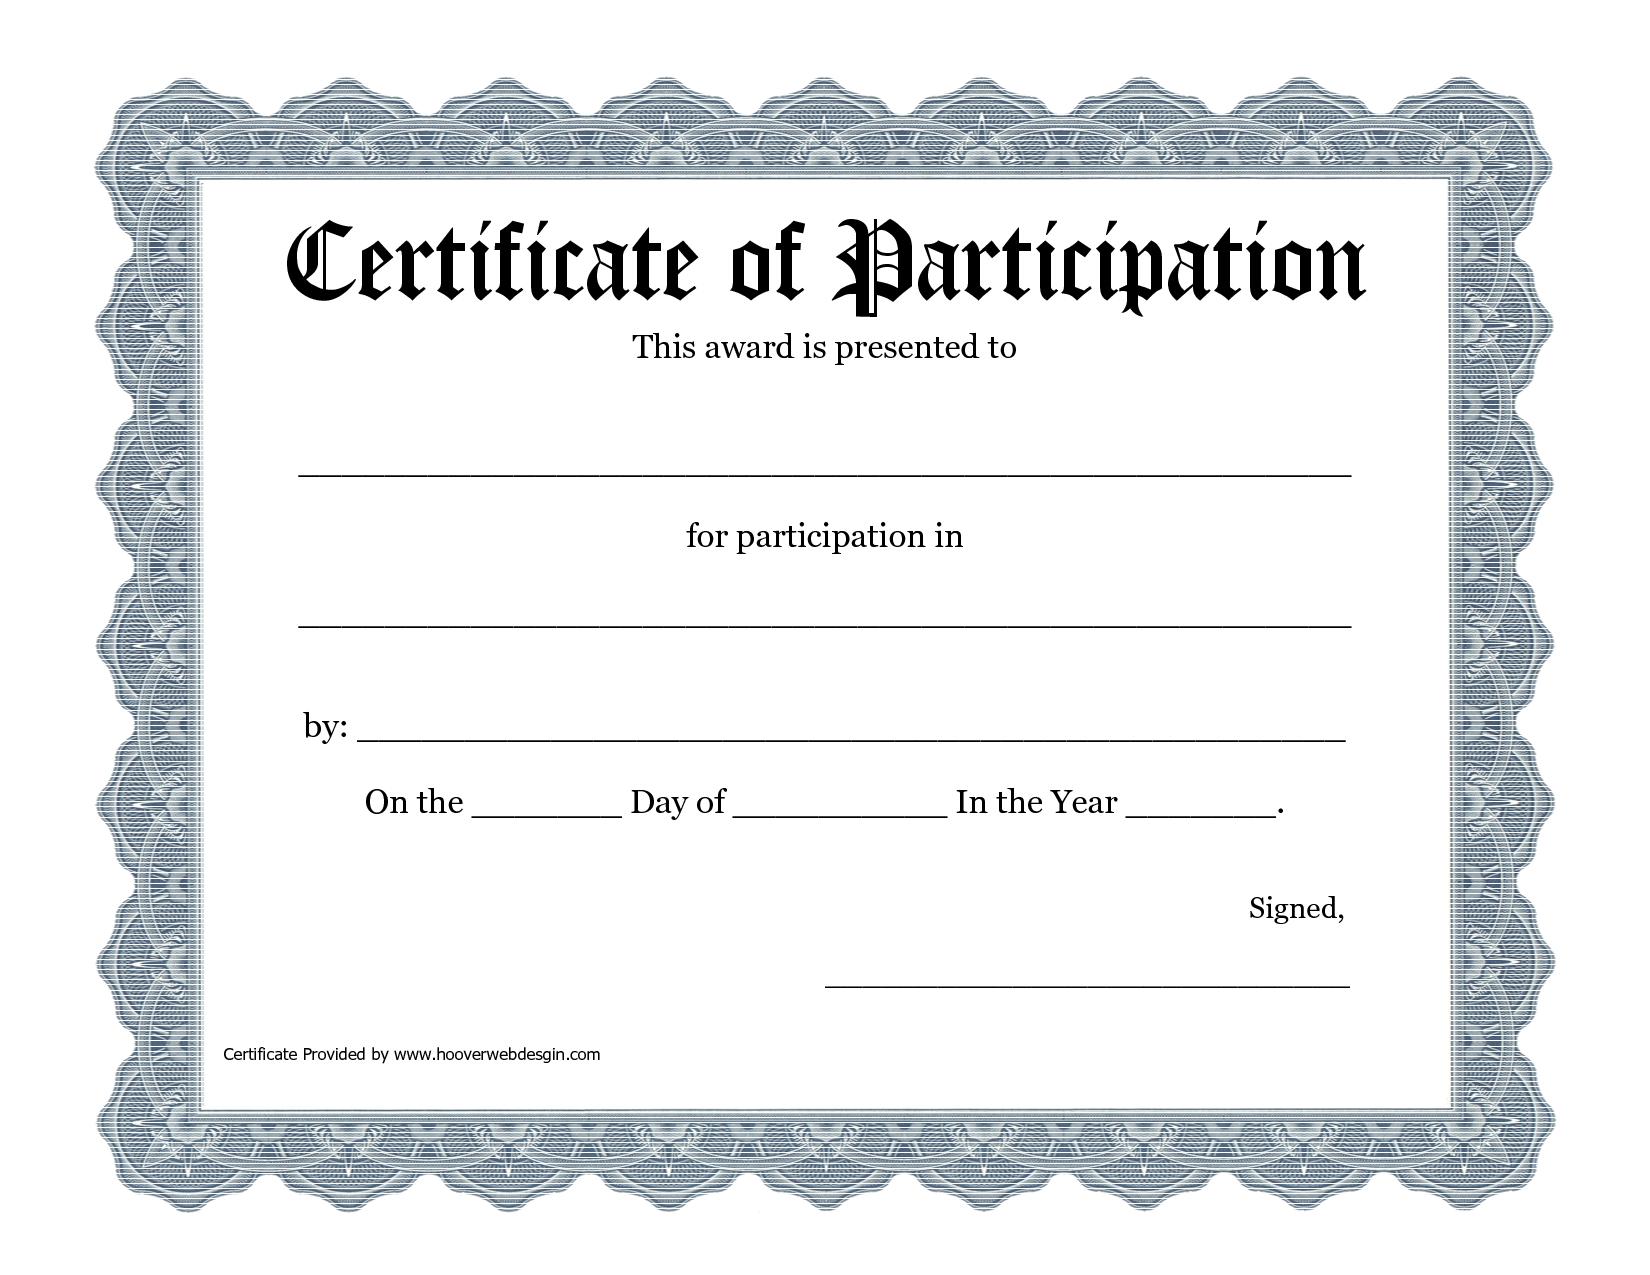 Free Printable Award Certificate Template - Bing Images | 2016 Art - Free Soccer Award Certificates Printable